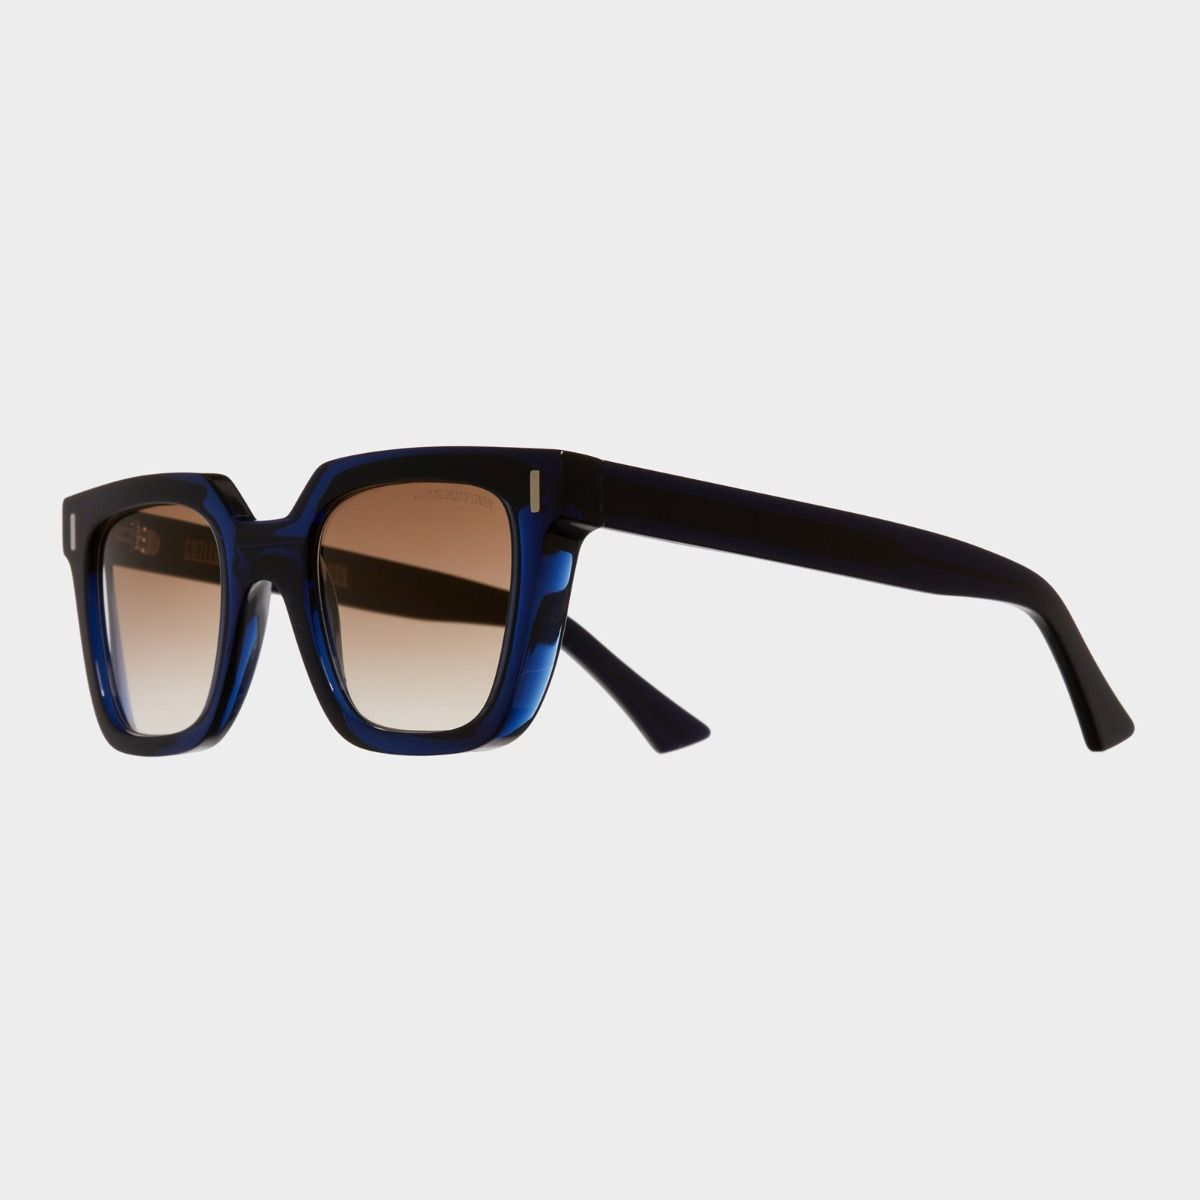 1305 Square Sunglasses-Blue Navy